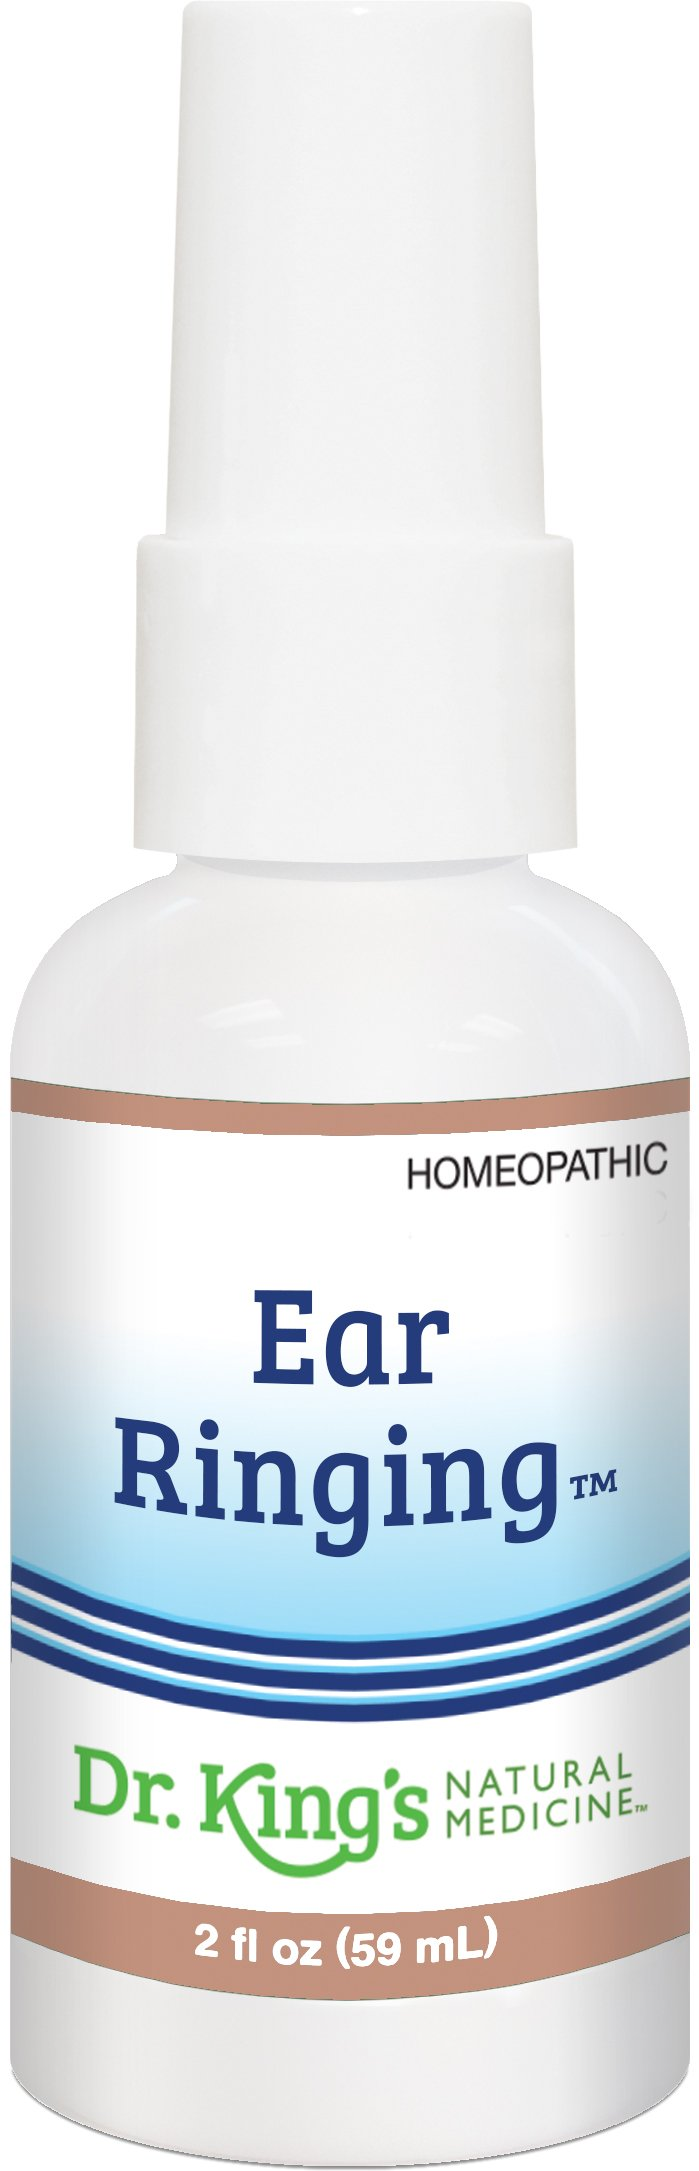 Dr. King's Natural Medicine Ear Ringing, 2 Fluid Ounce